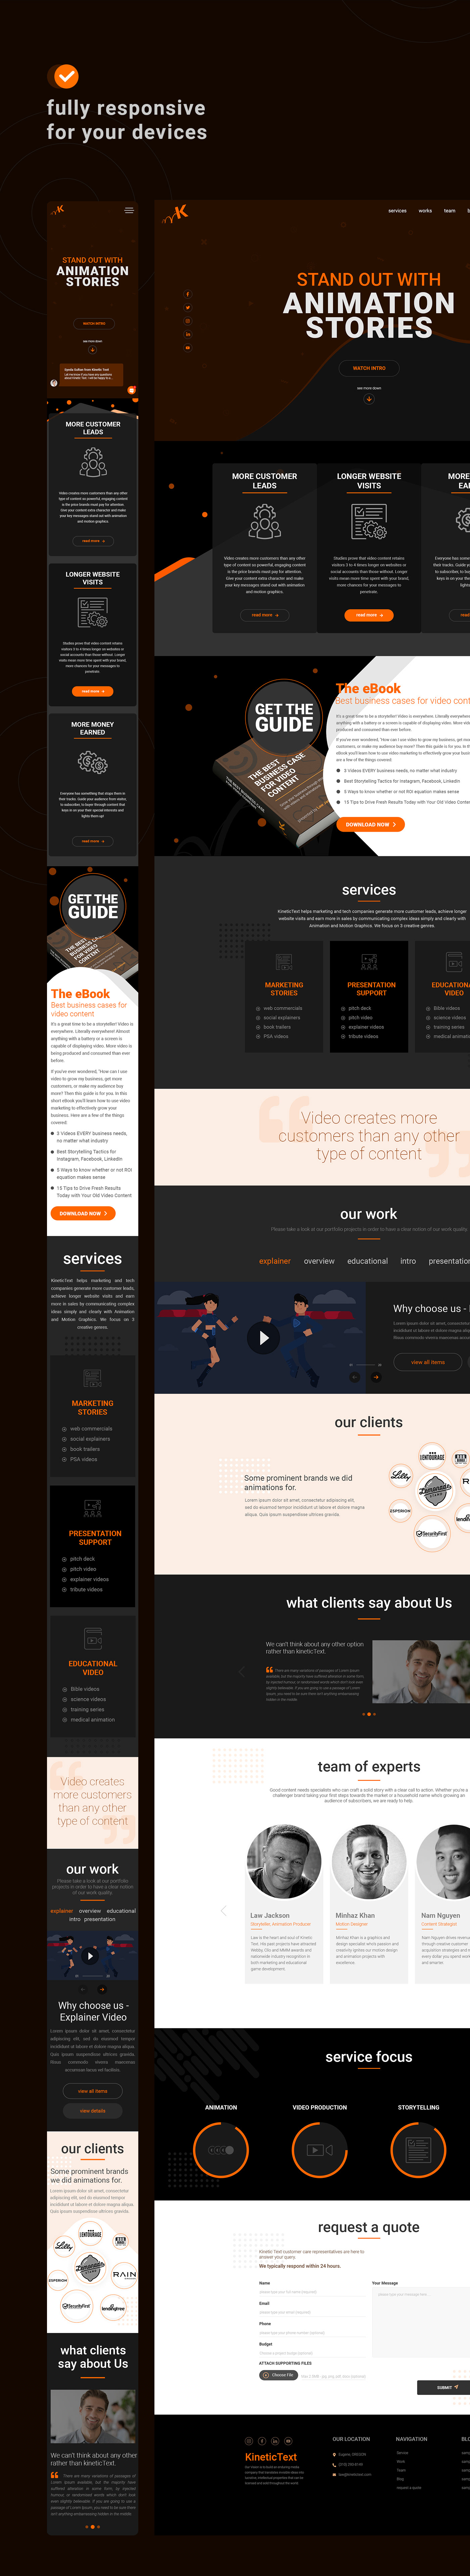 animation company animation studio landing page Web Design  Website Design Website UI/UX Design